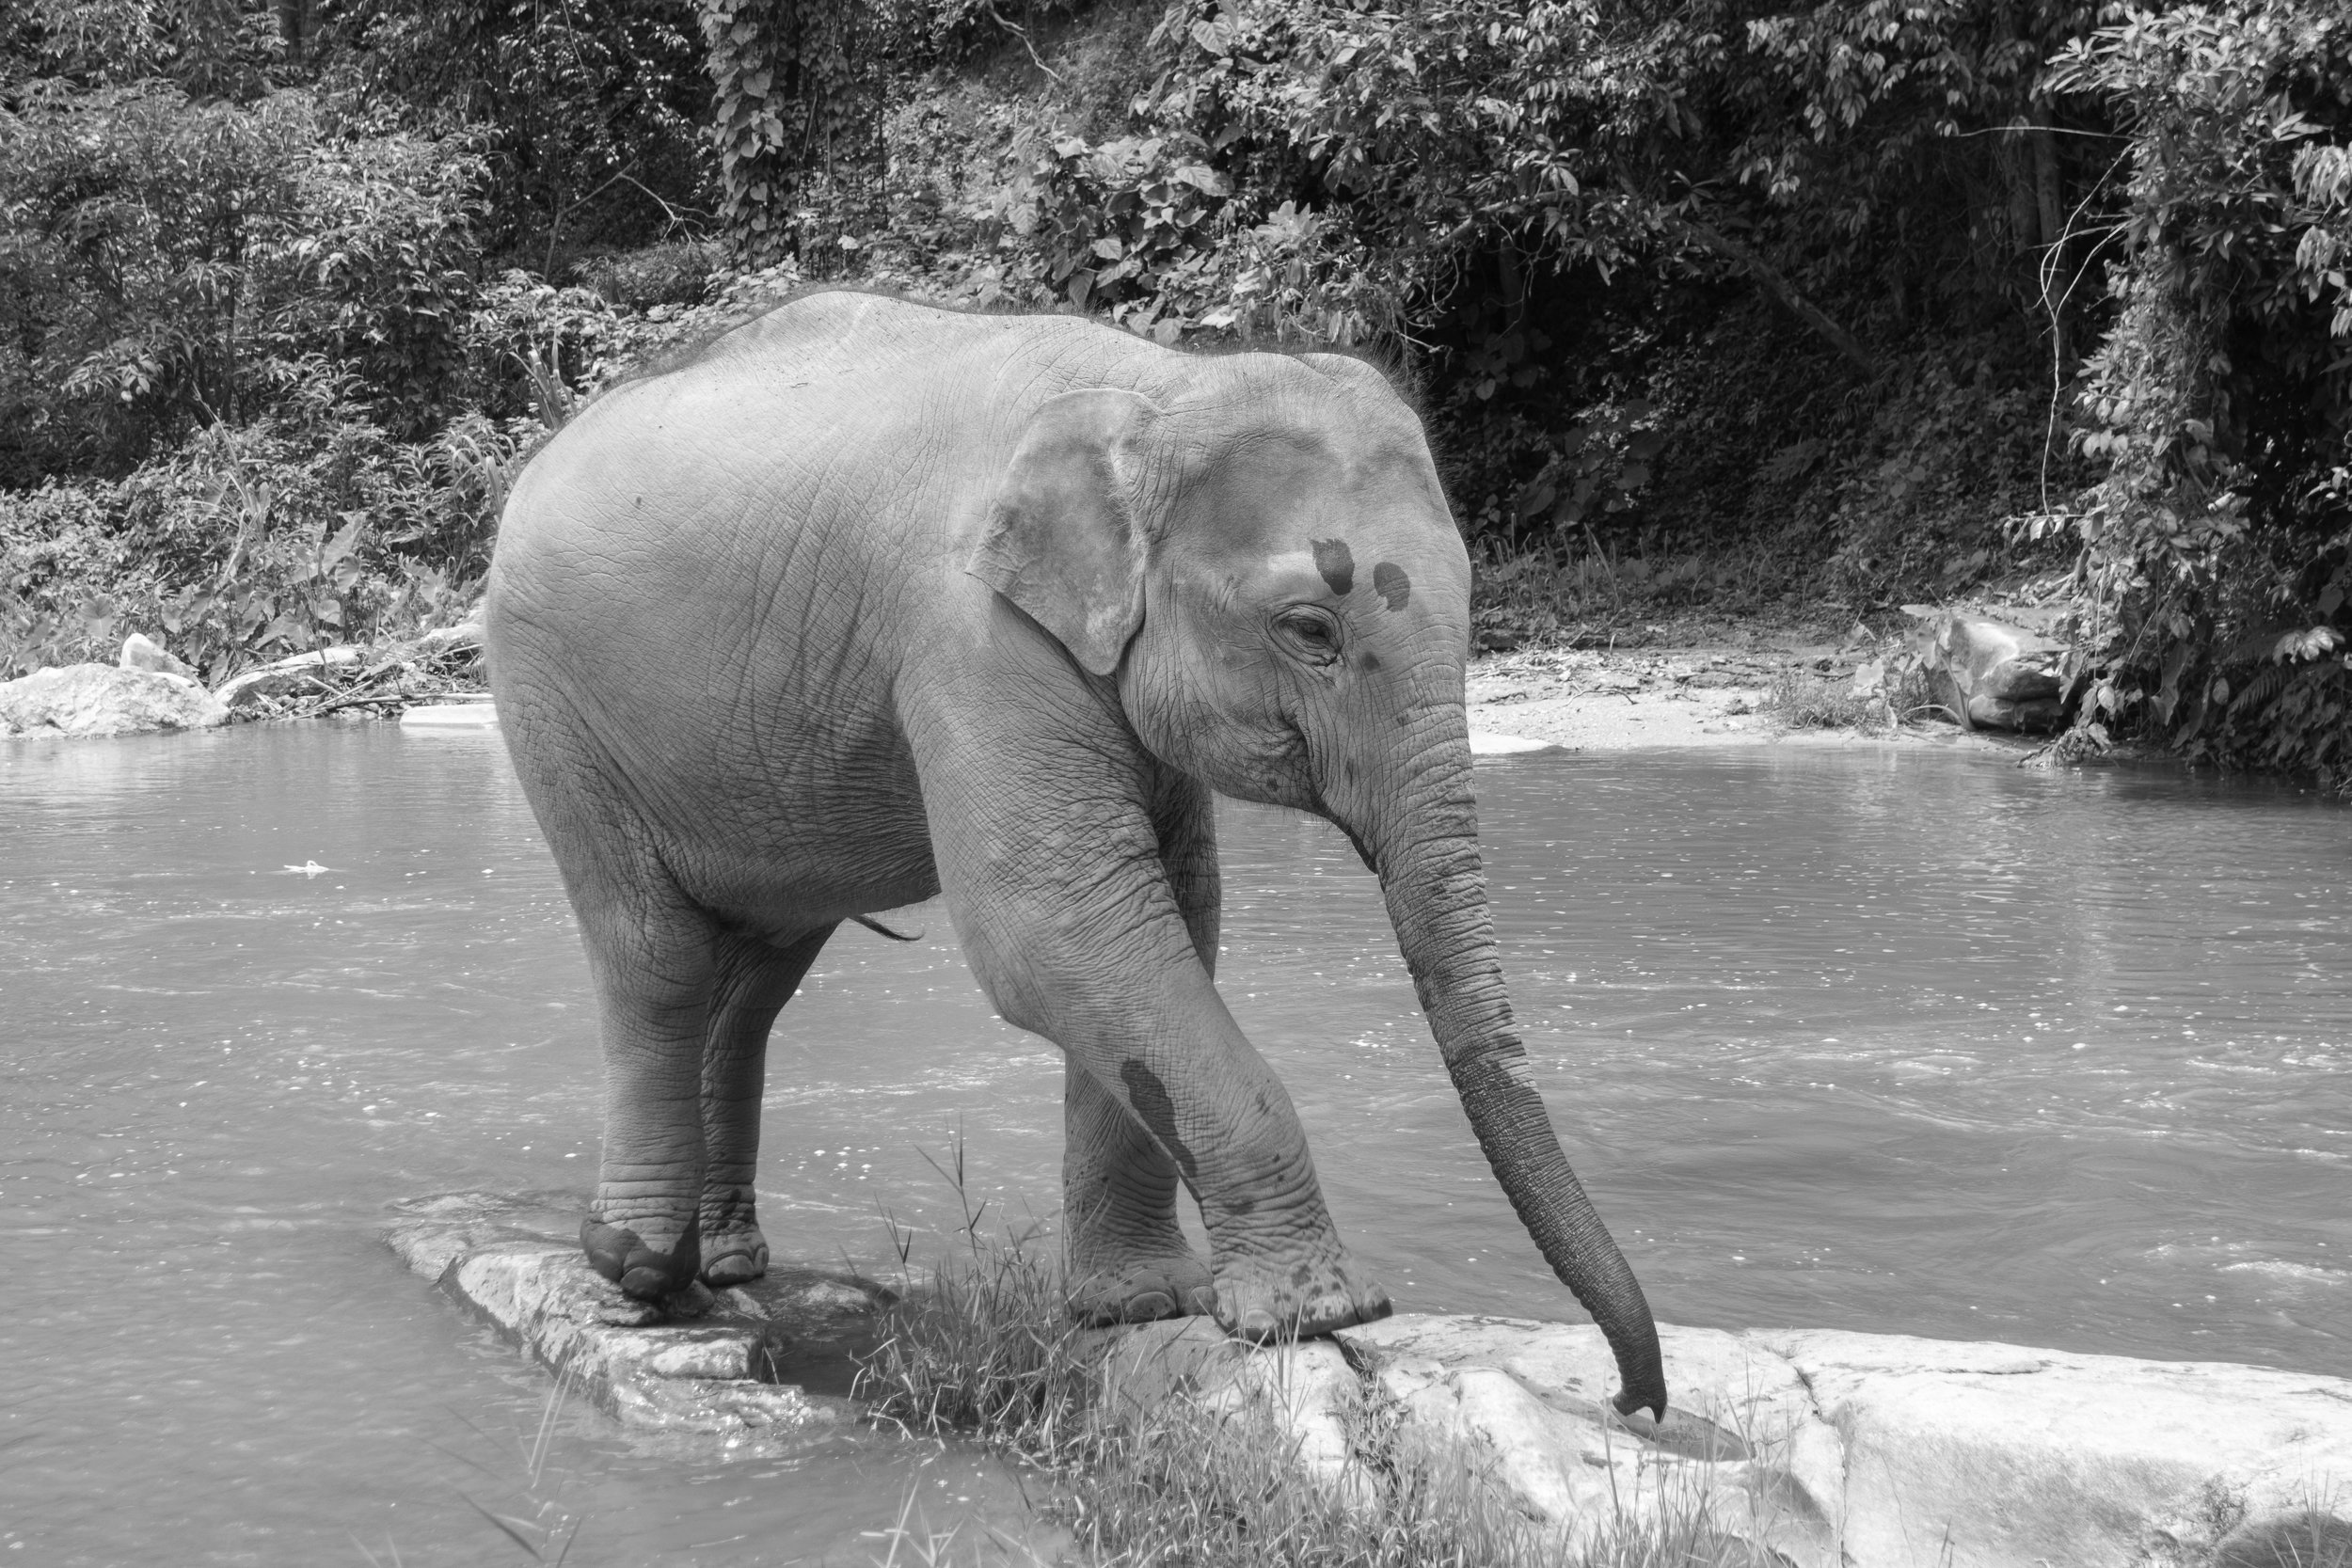 The-world-of-elephants-black-and-white-Thailand-cute-elephant.jpg